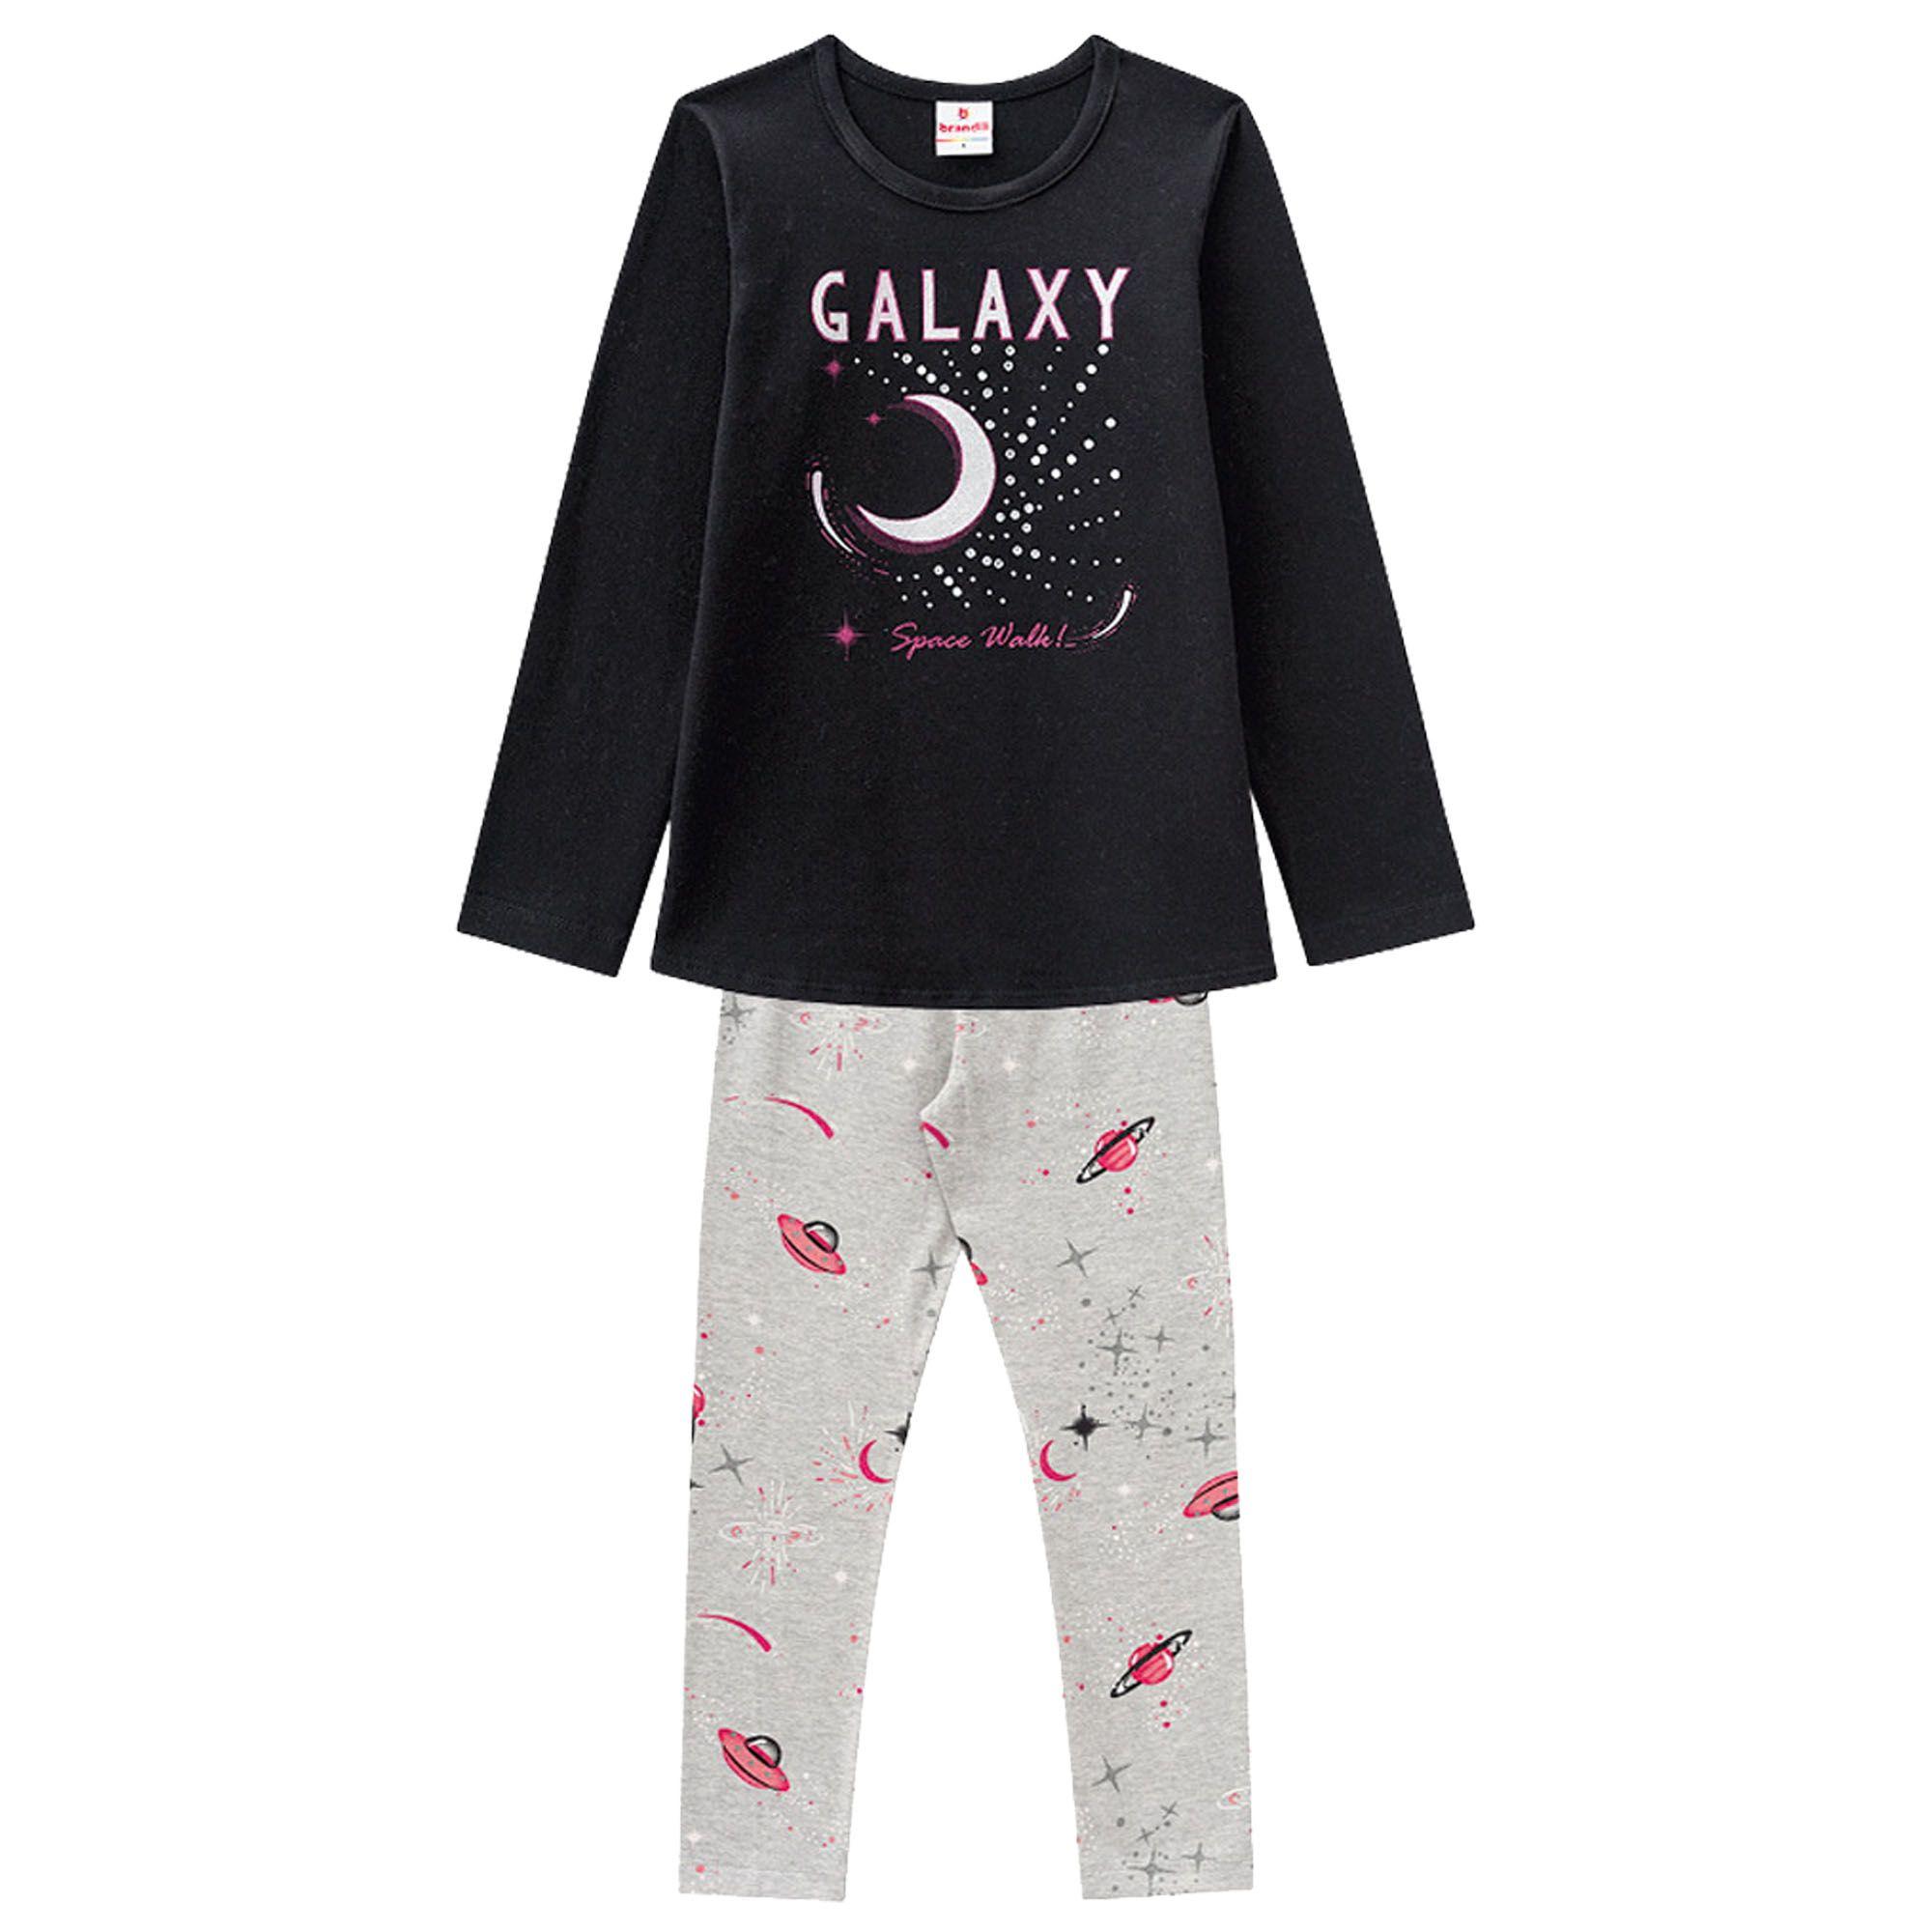 Conjunto Inverno Brandili Estampa Galaxy Space Wolk com Legging em Cotton - 12 ao 16